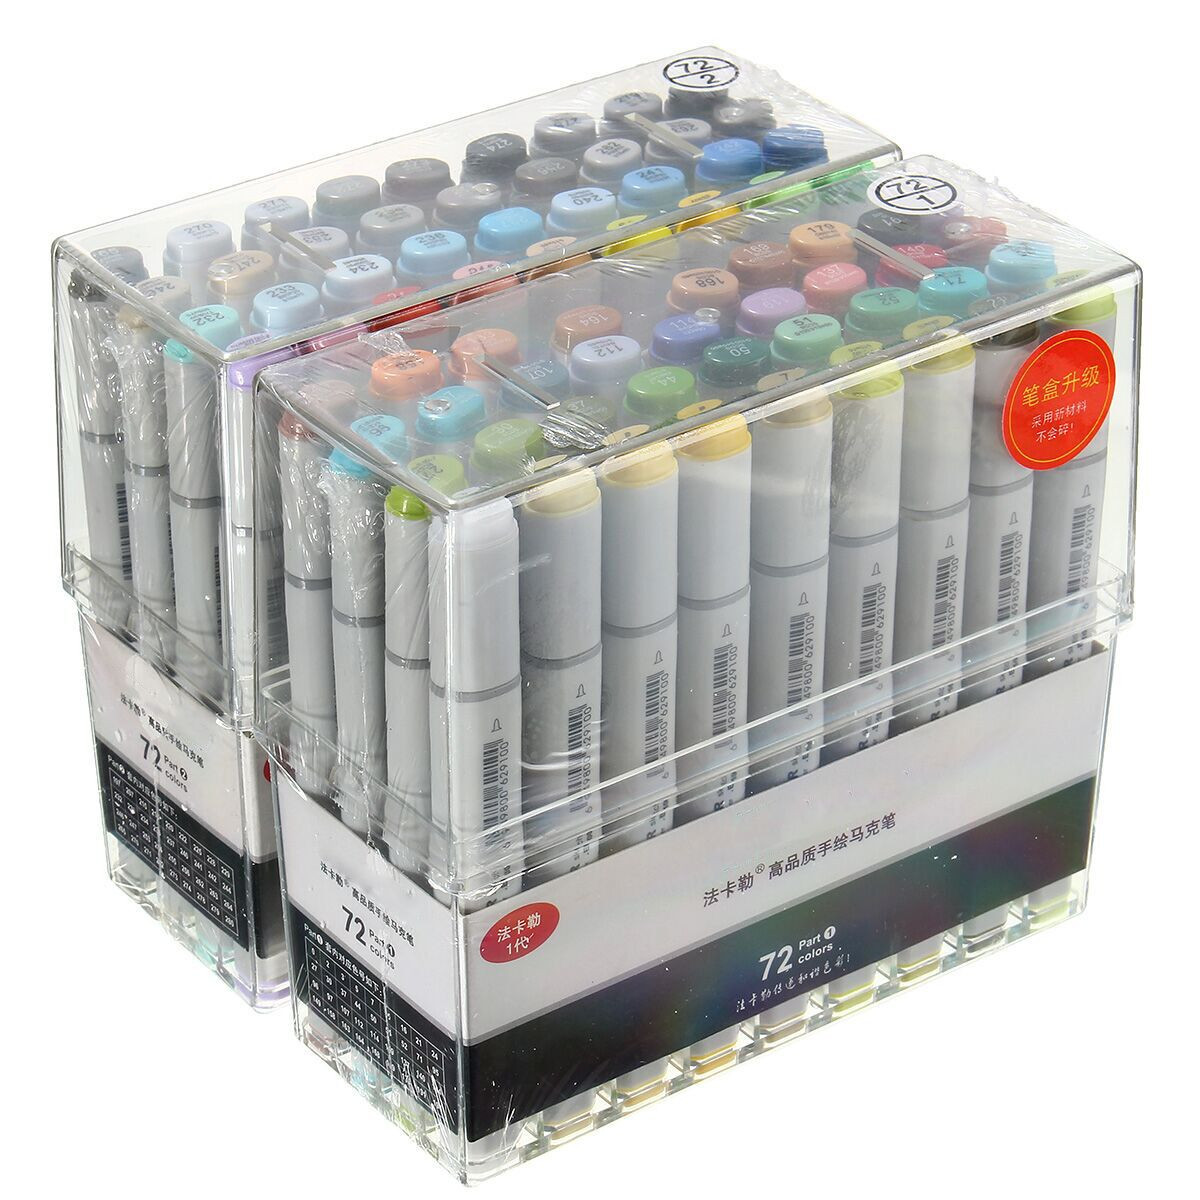 72Pcs Colors Artist Copic Sketch Markers Set Fine Nibs Twin Tip Board Pen Design Marker Pen For Drawing Art Set